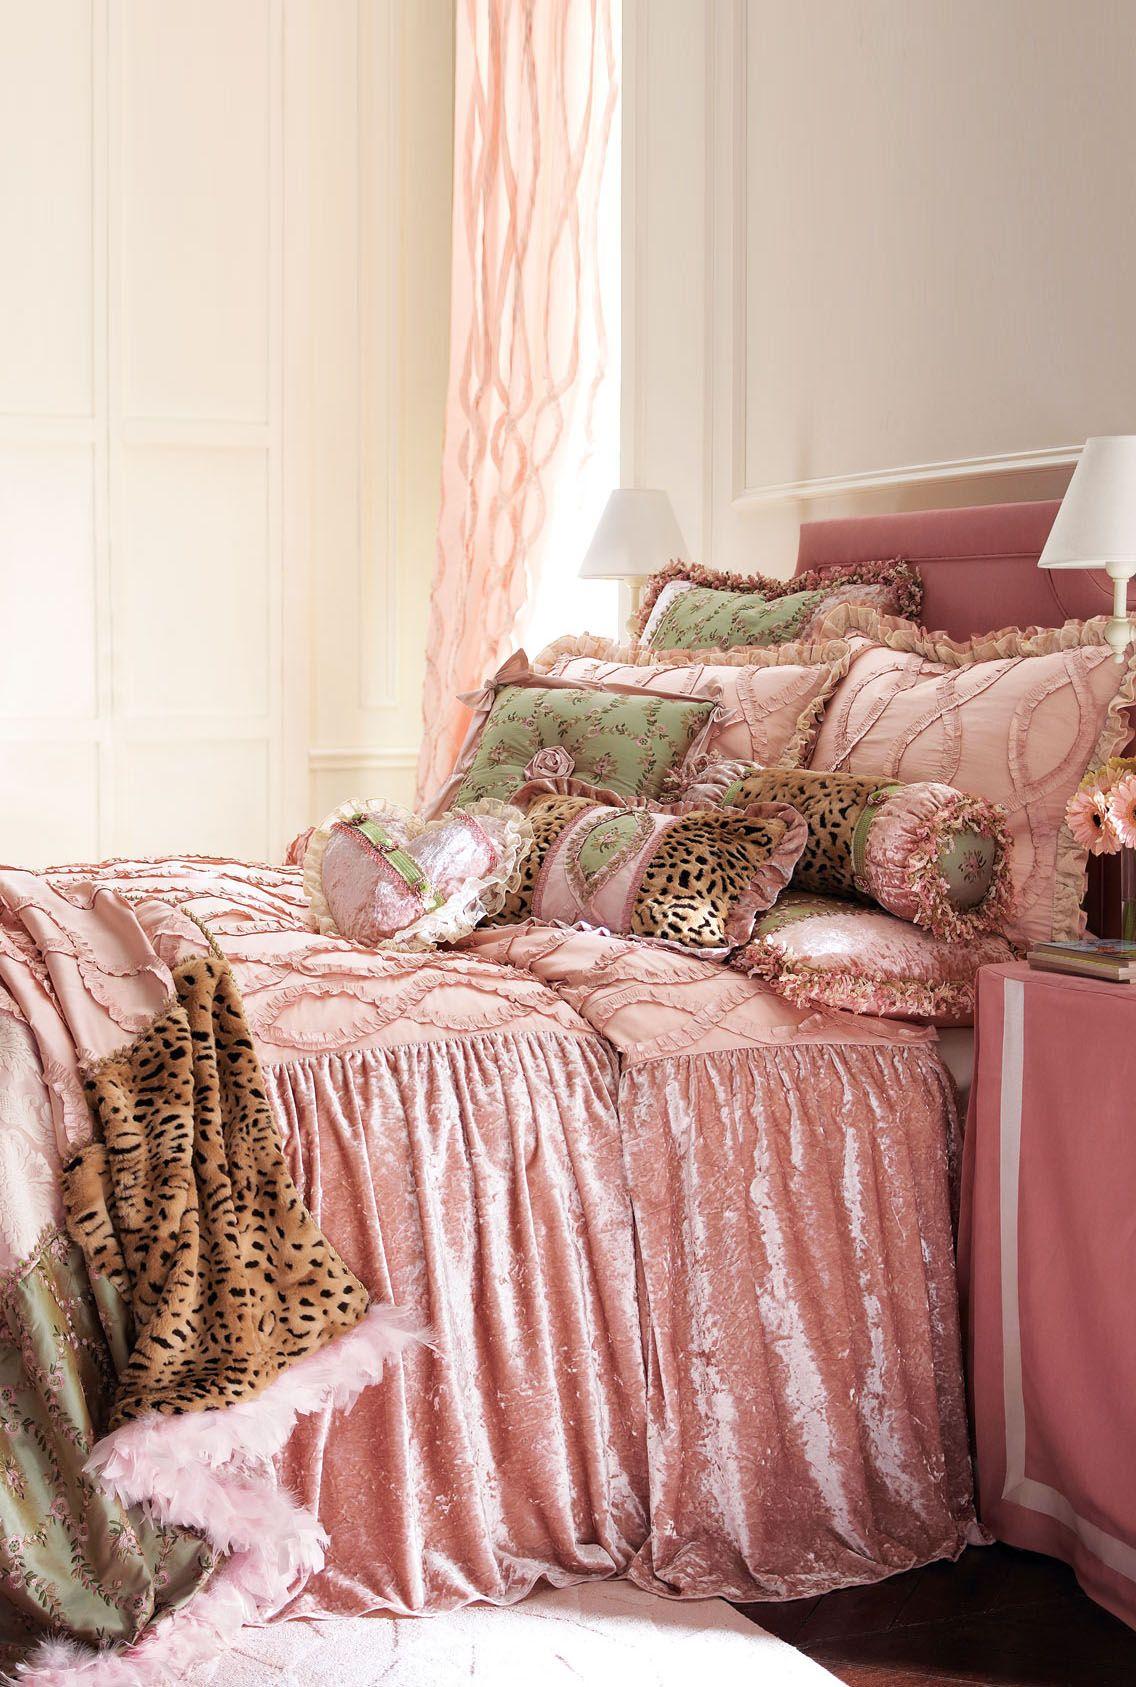 neiman marcus bedroom furniture. Dian Austin Couture \ Neiman Marcus Bedroom Furniture H